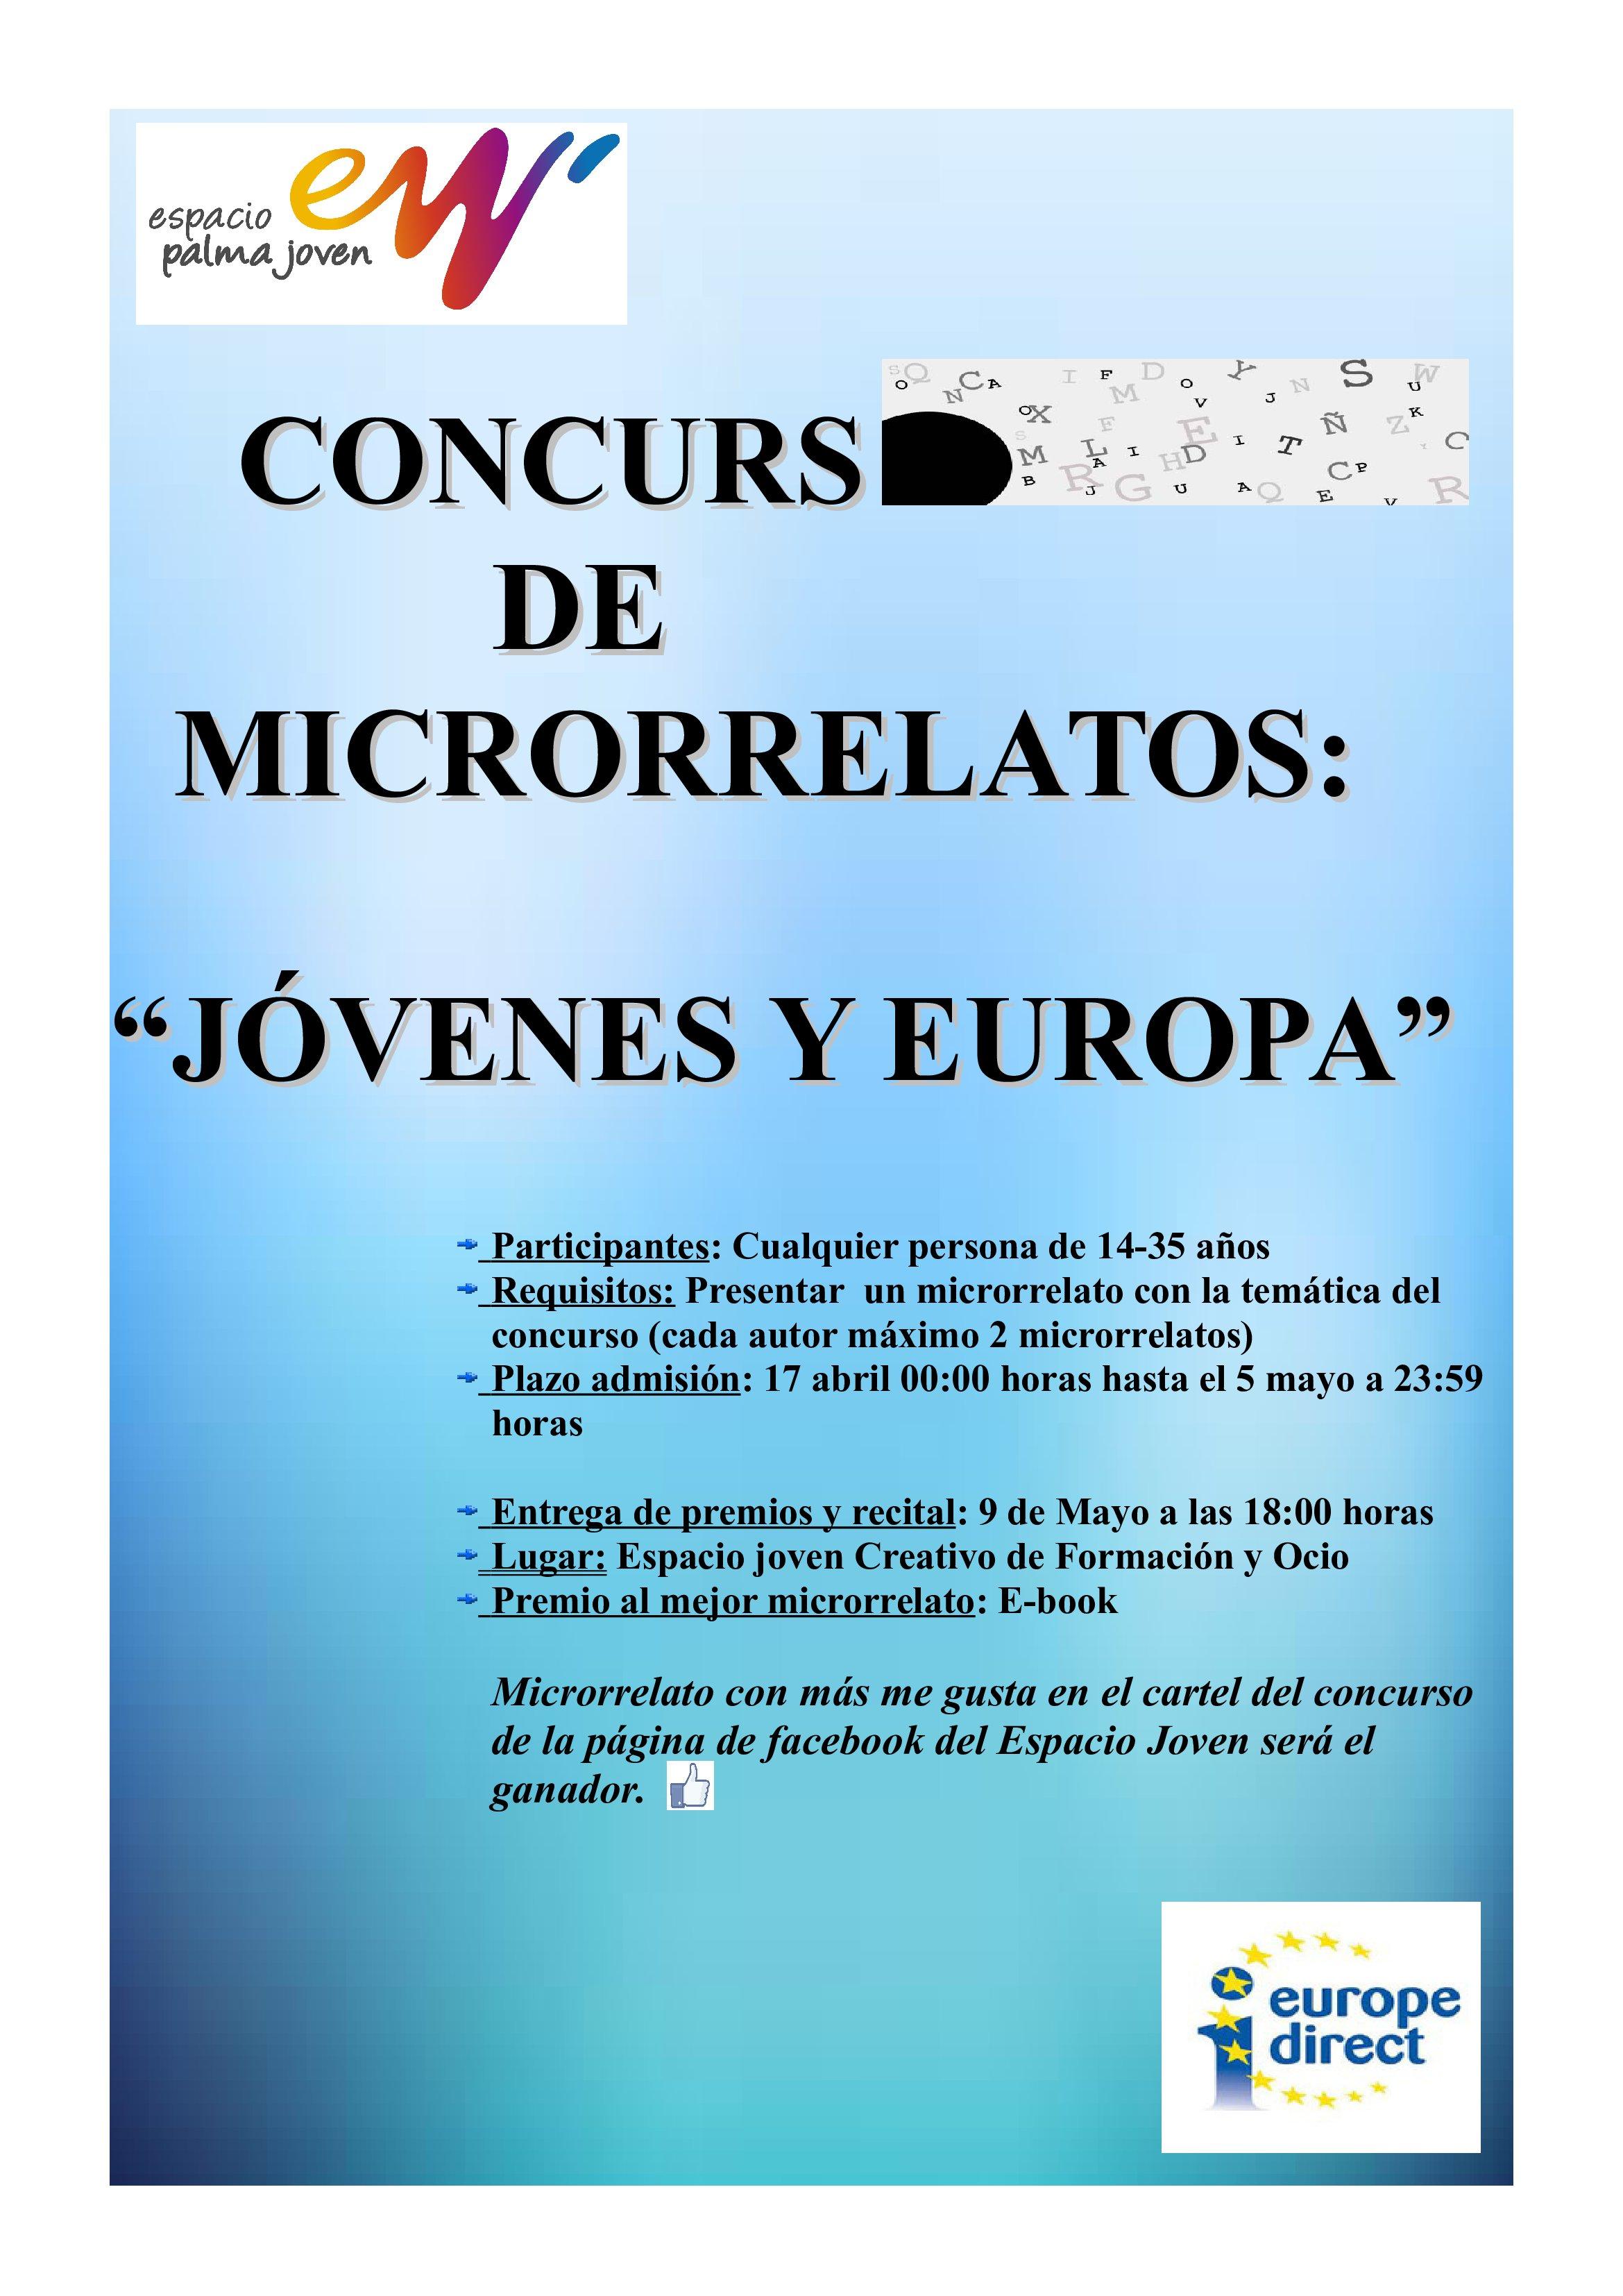 https://www.palmadelrio.es/sites/default/files/cartel_microrrelato.jpg